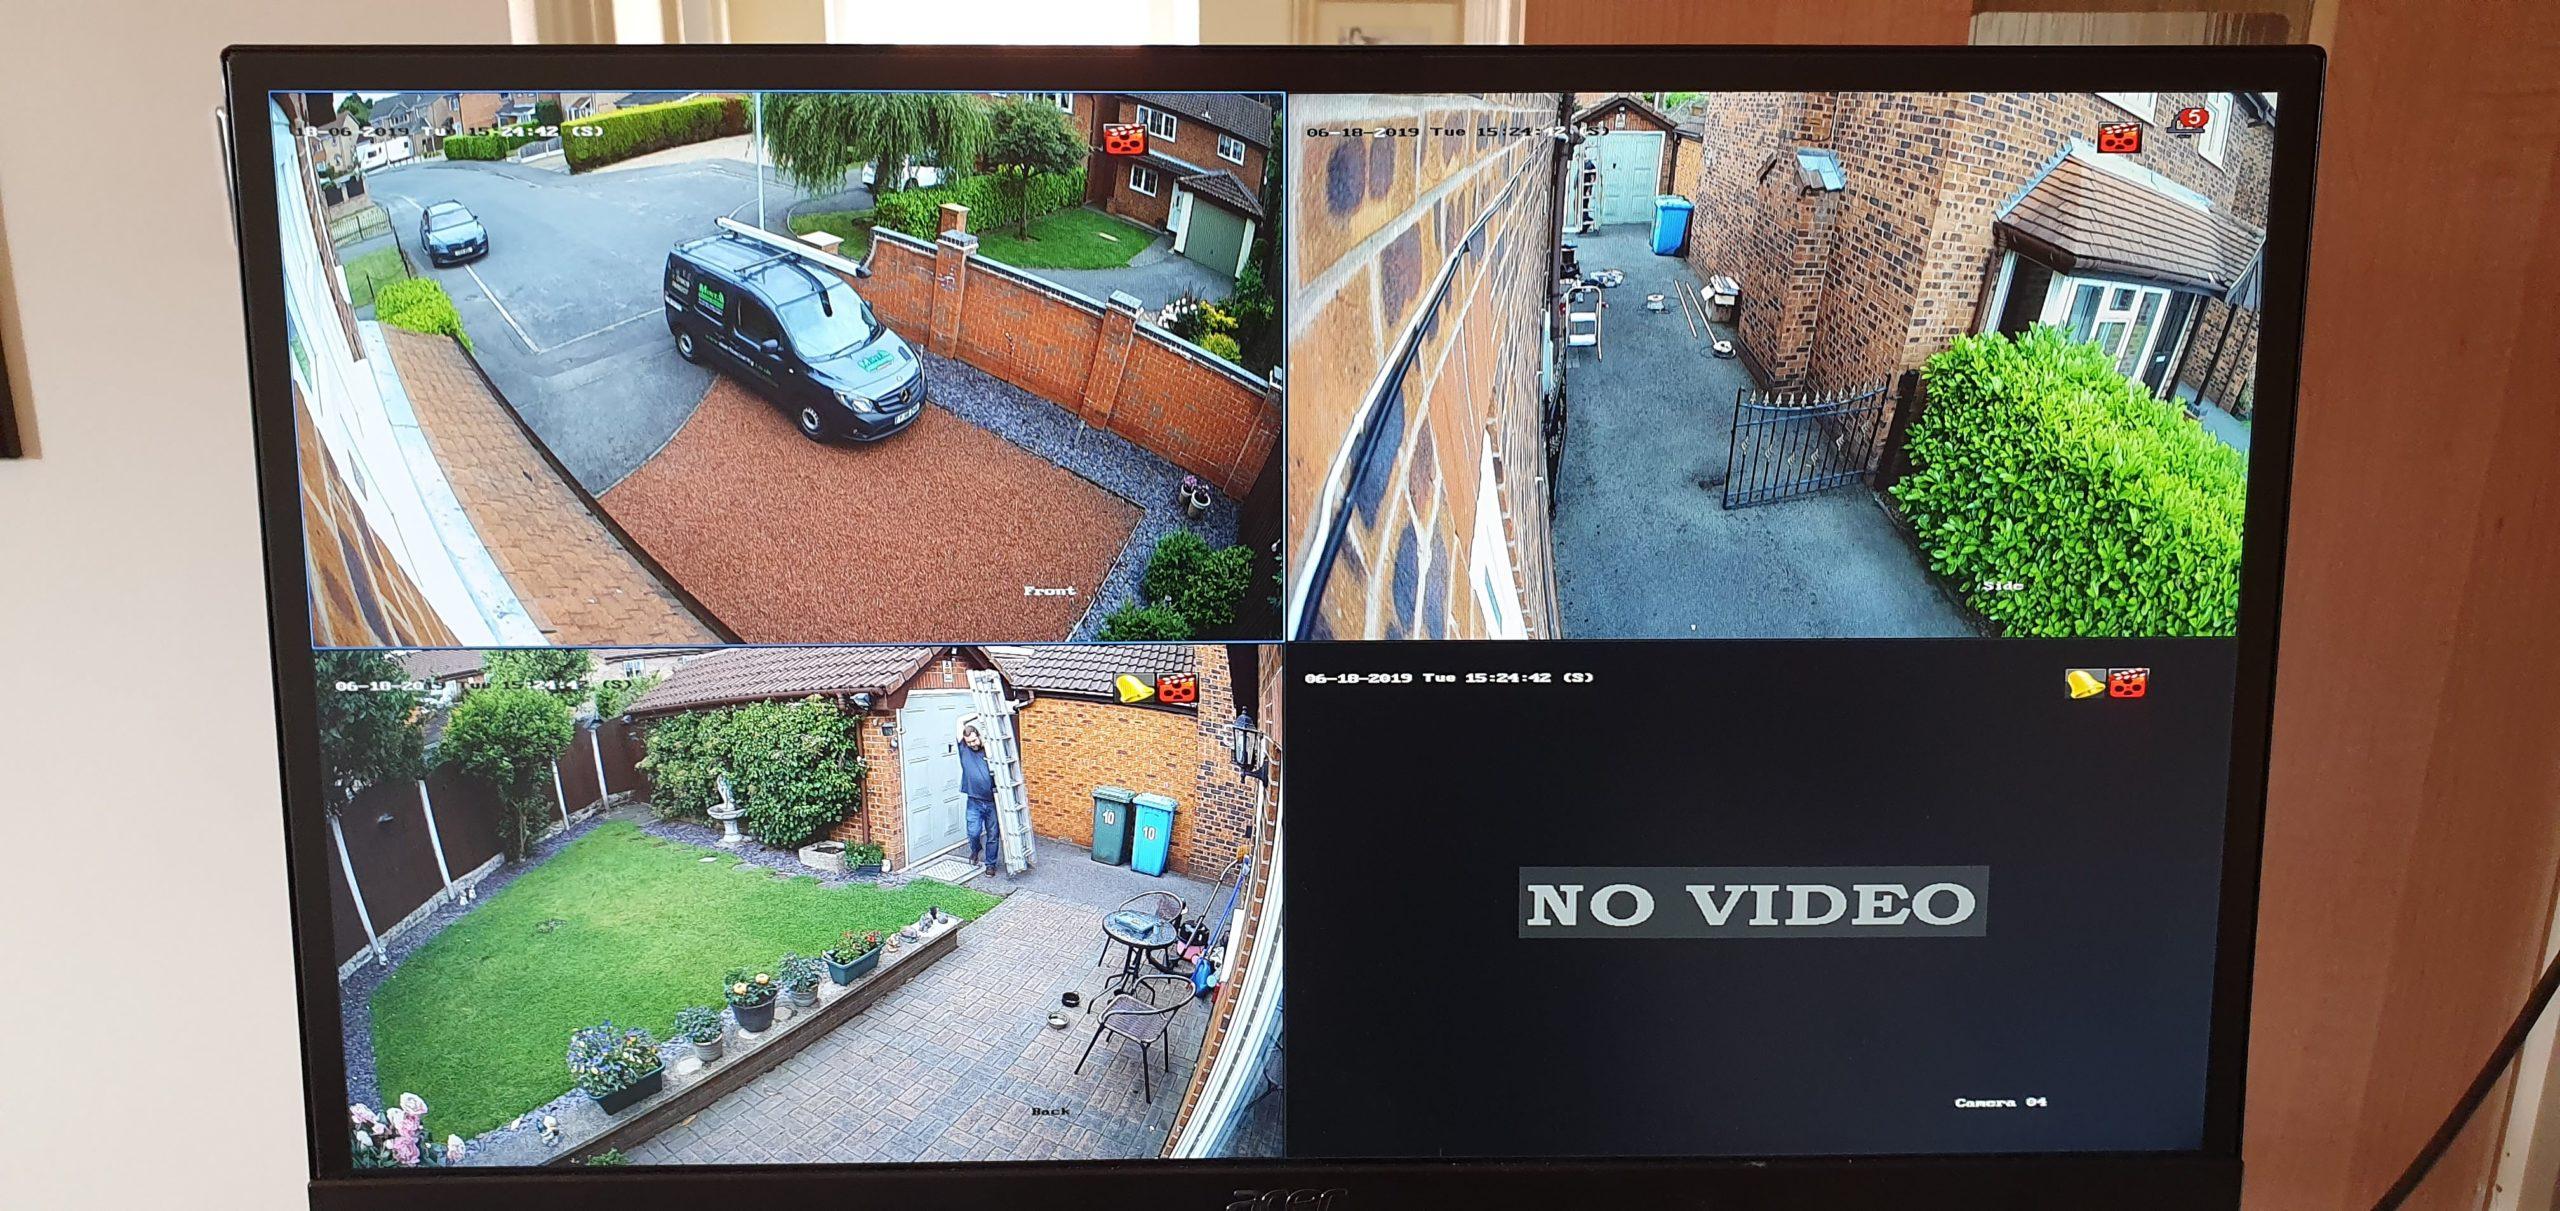 Sheffield CCTV Installer Praised by Judge 1